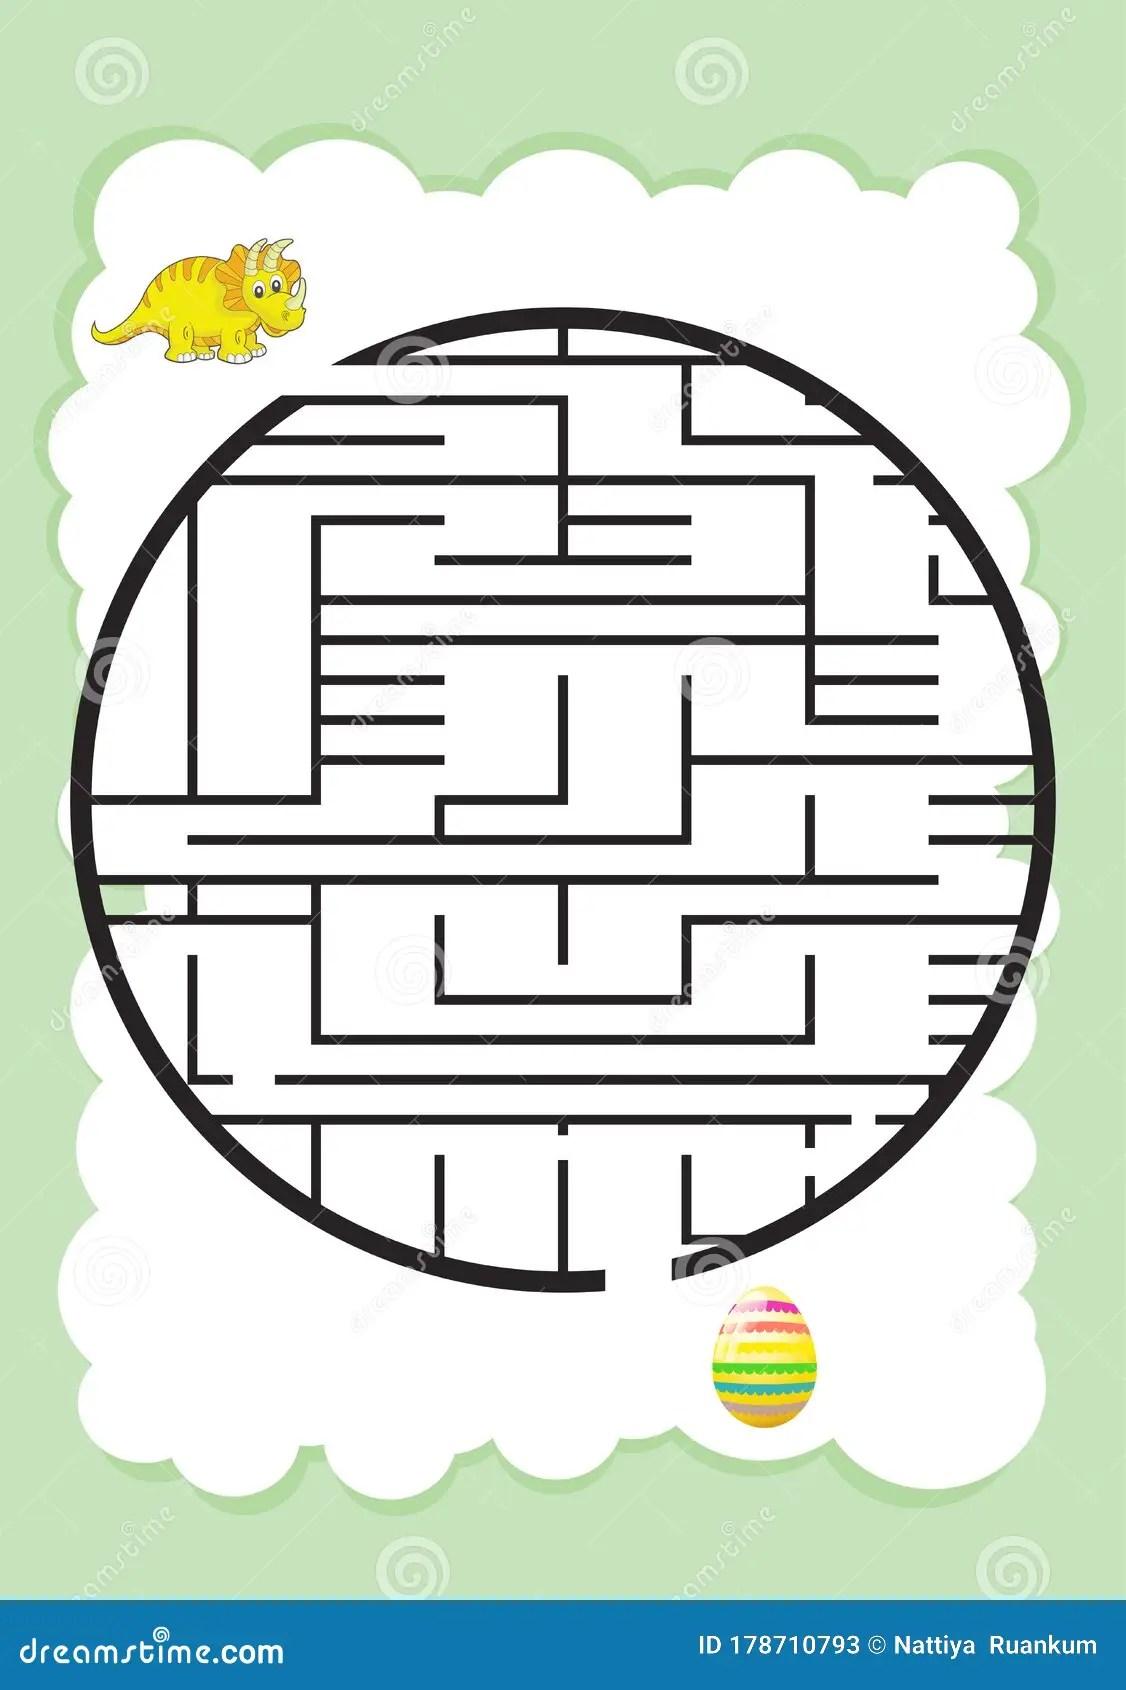 Printable Mazes For Kids Maze Games Worksheet For